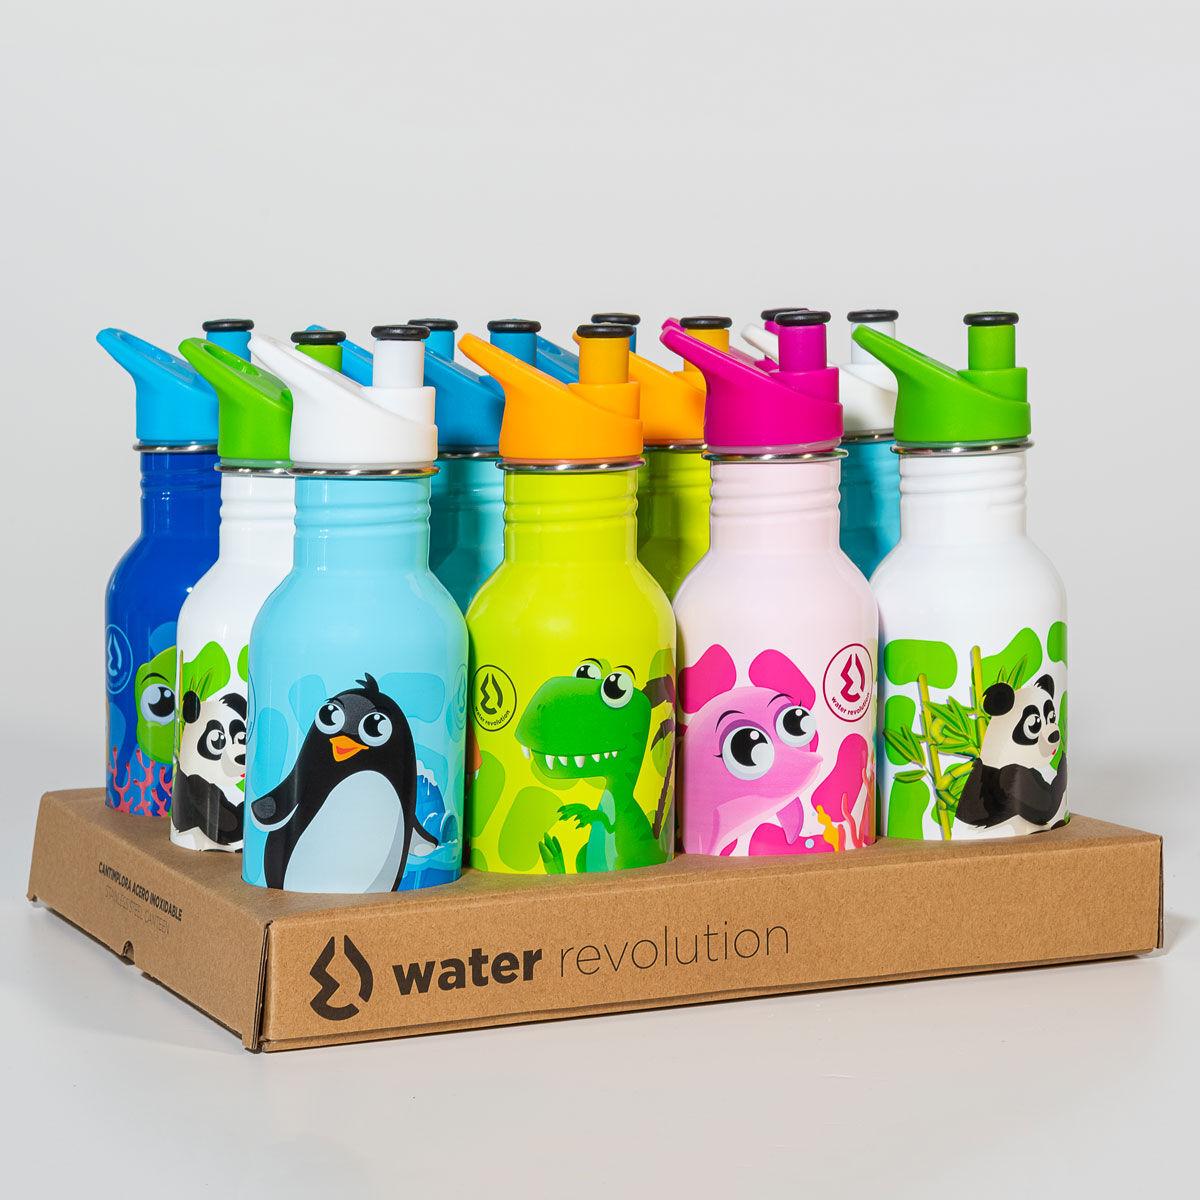 Botella Water Revolution 500ml surtido 8435607600506